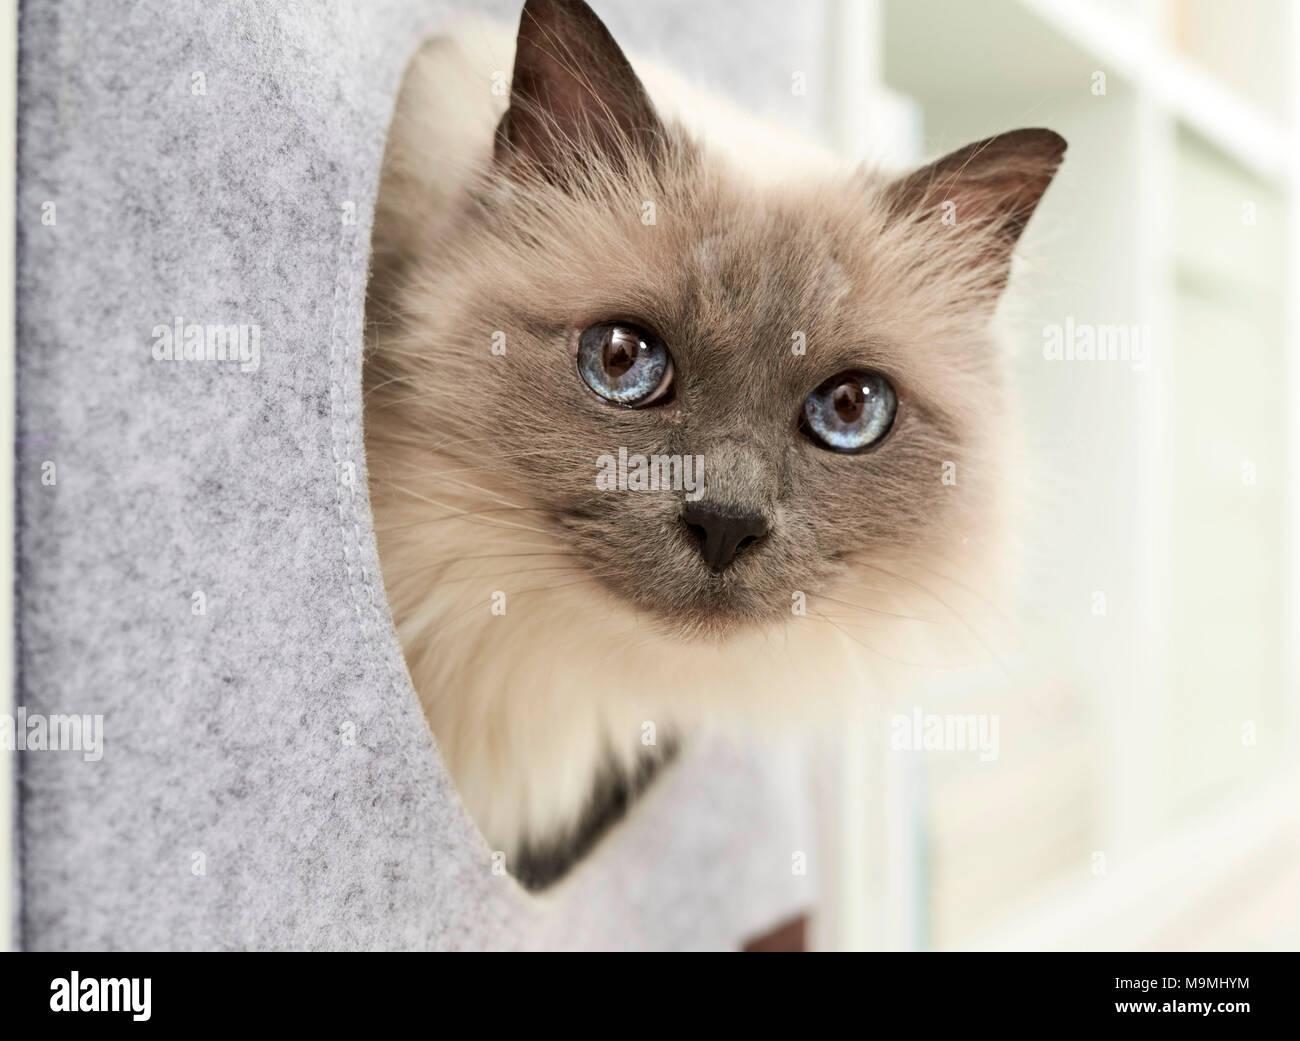 Sacred Birman, Birman. Adult cat in a felt den, fitting into a shelf. Germany. - Stock Image